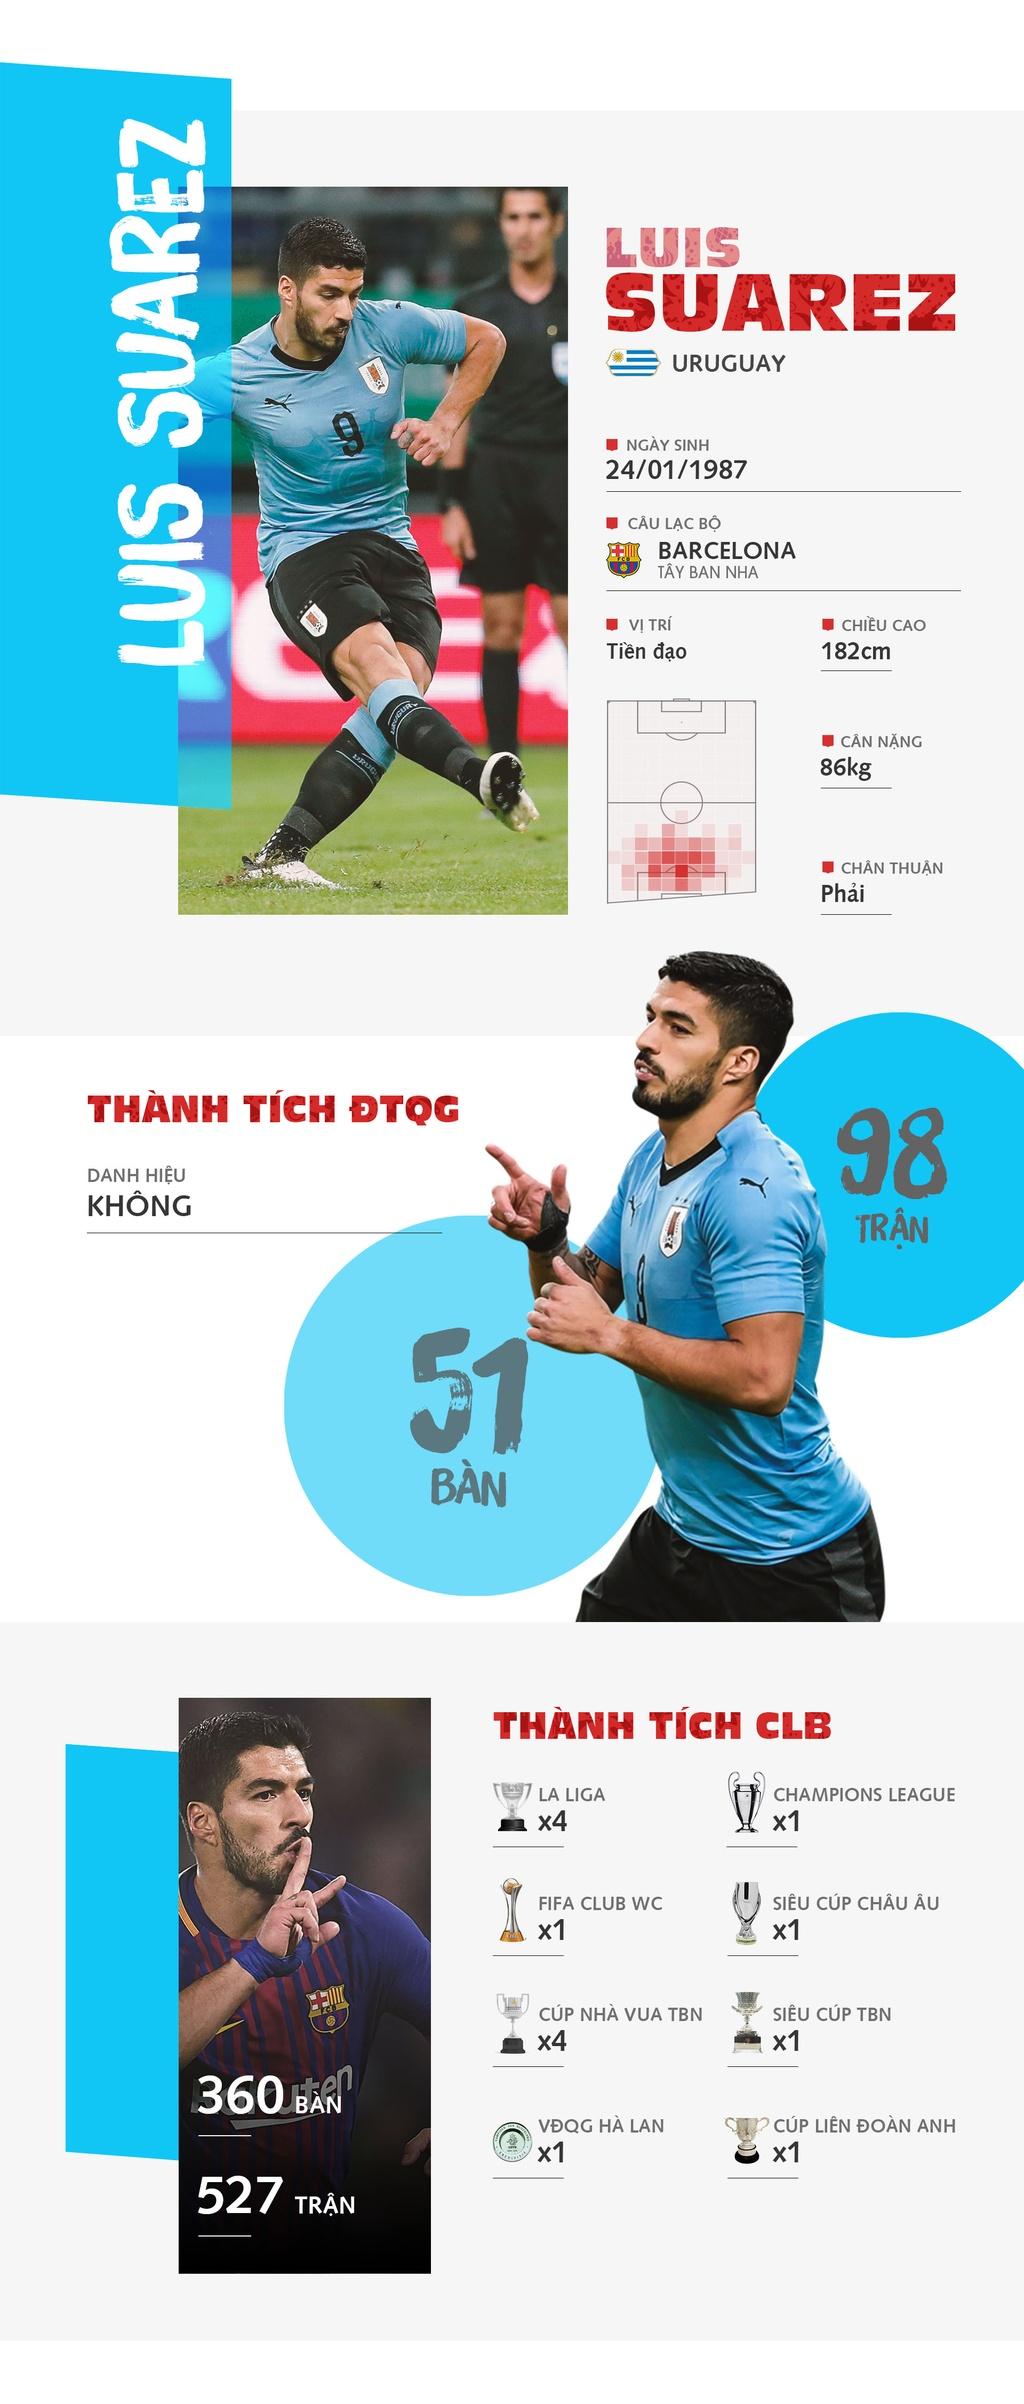 Luis Suarez - hong phao chu luc cua Uruguay hinh anh 1